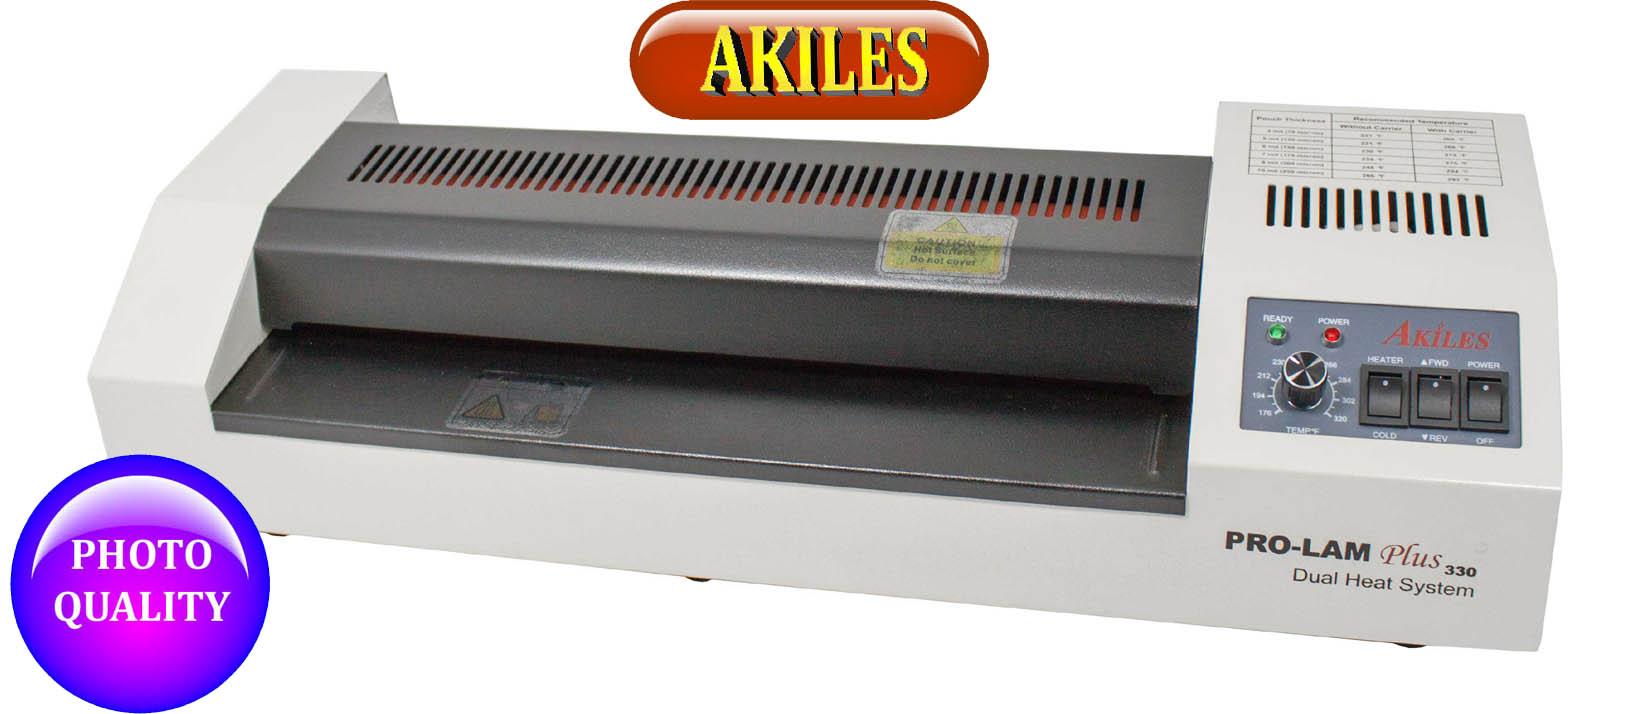 Akiles pouch laminator Prolam plus 330